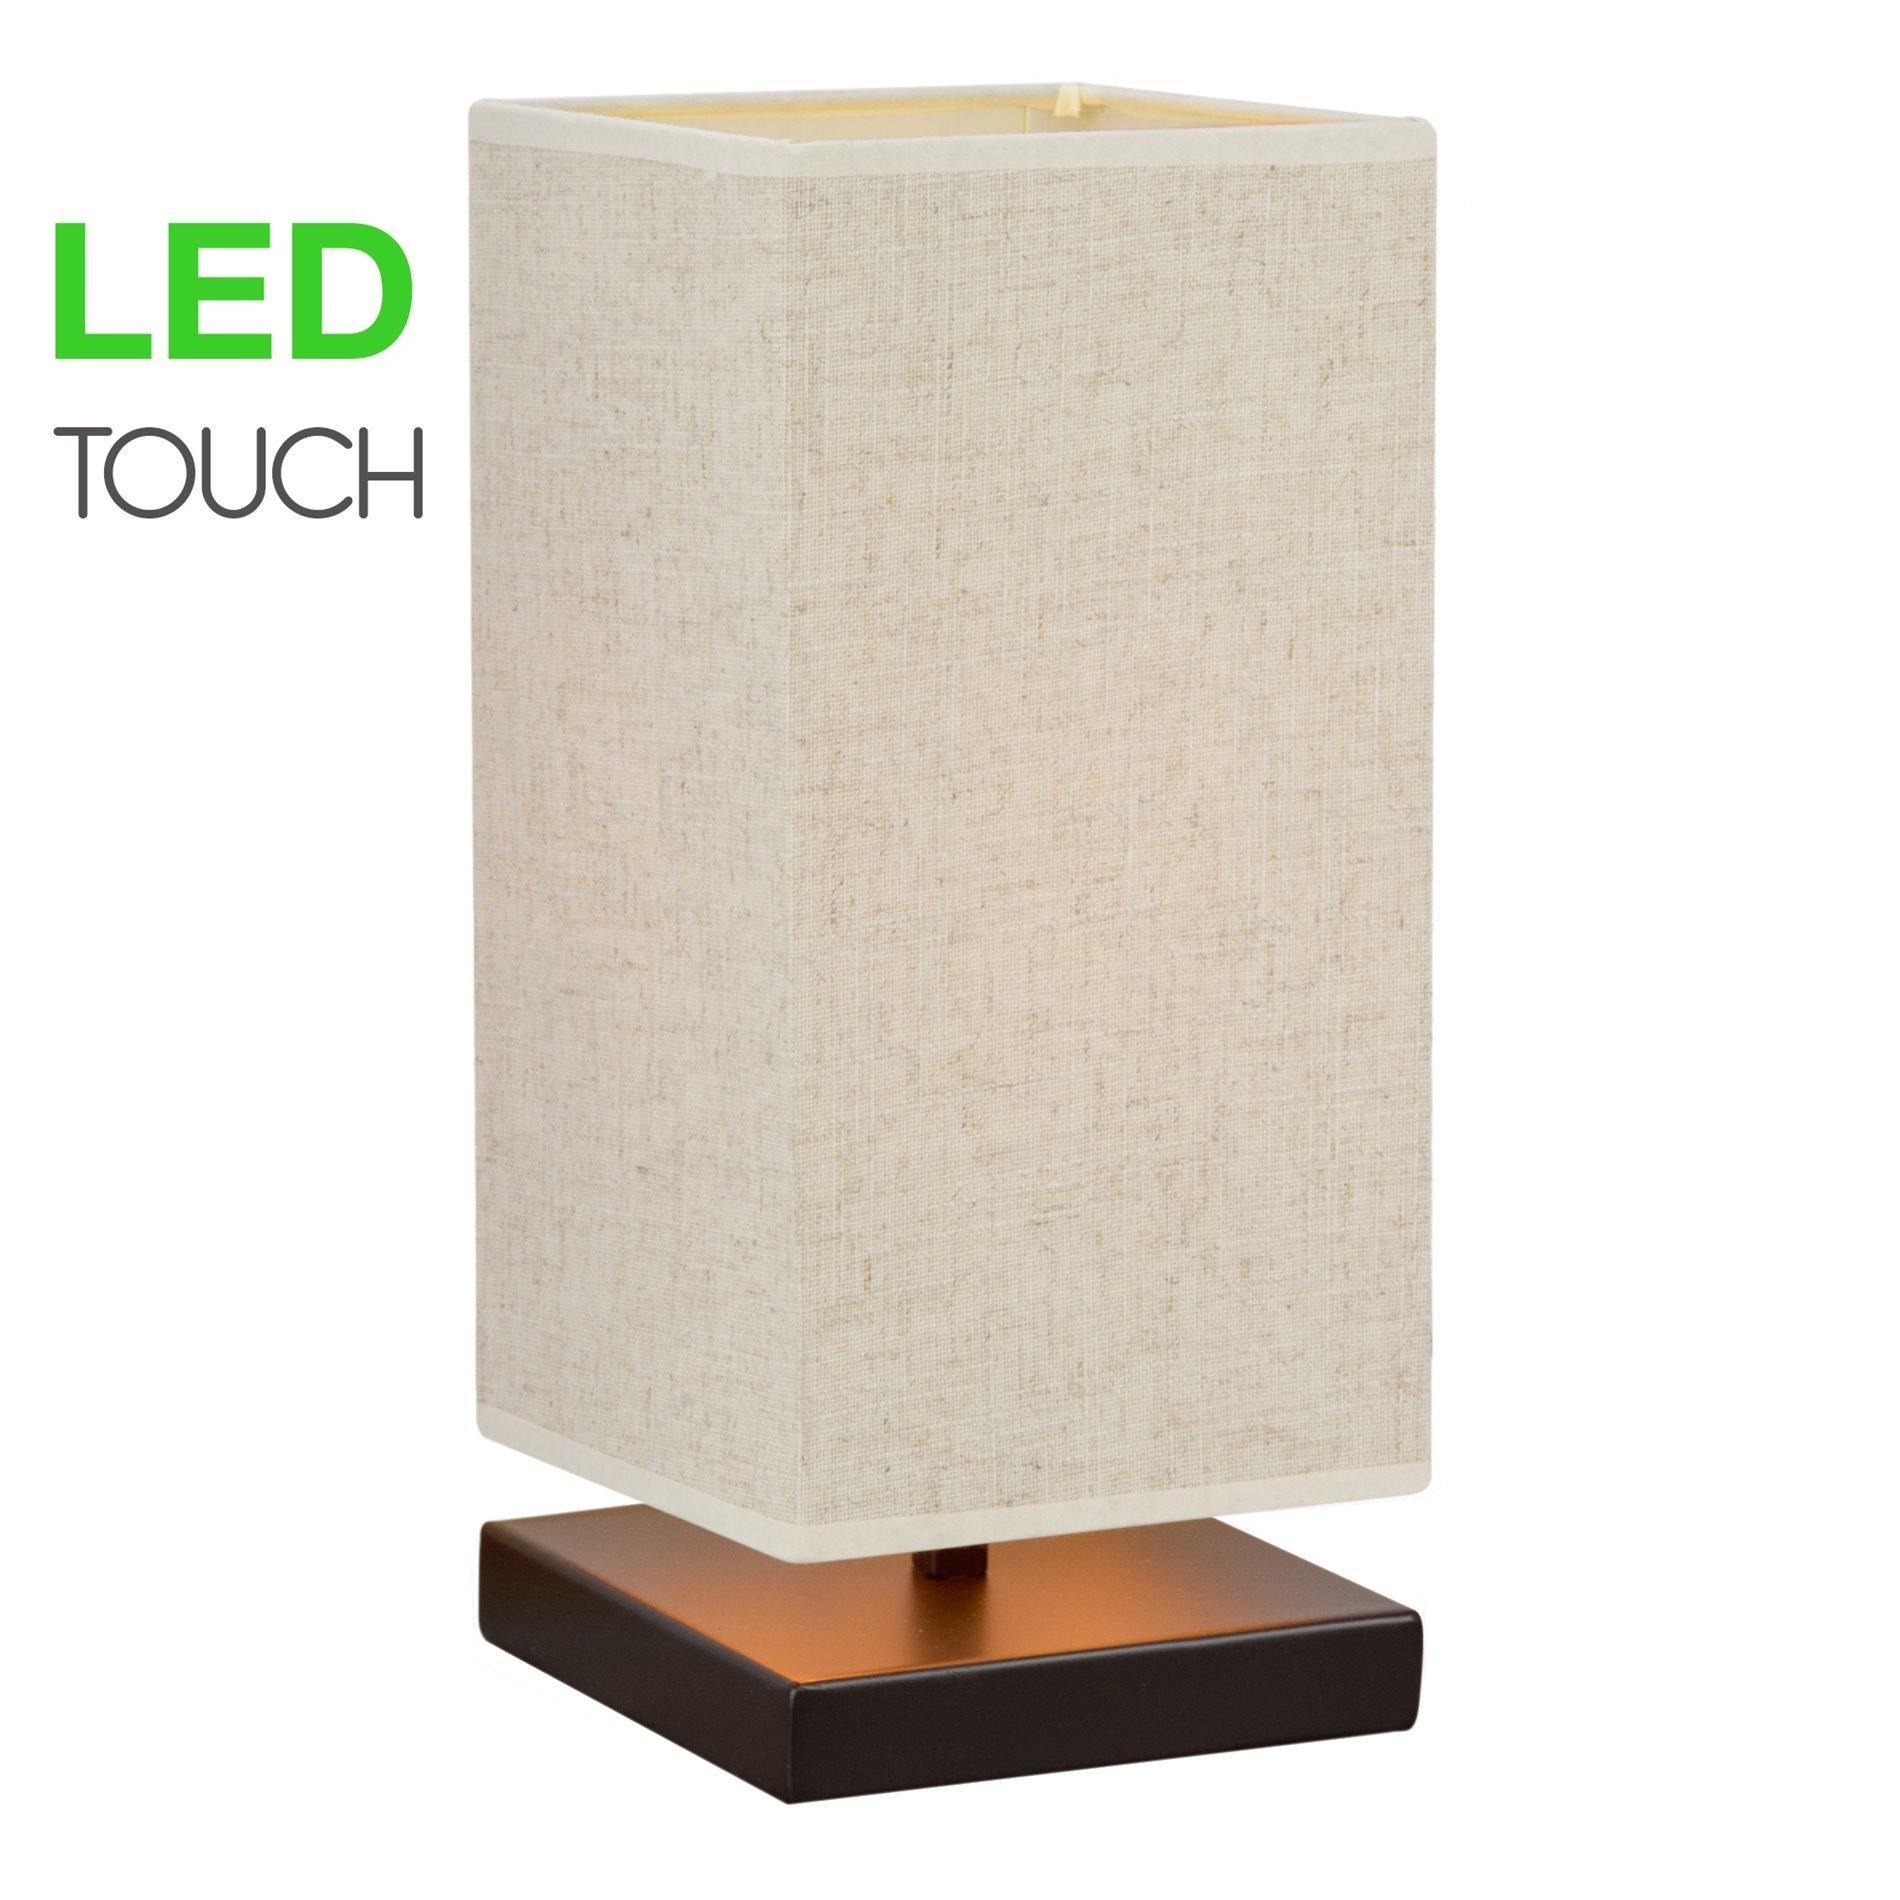 Revel/Kira Home Lucerna 13'' TOUCH Bedside Table Lamp + 4W LED Bulb (40W eq.) Energy Efficient, Eco-Friendly, Honey Beige Shade